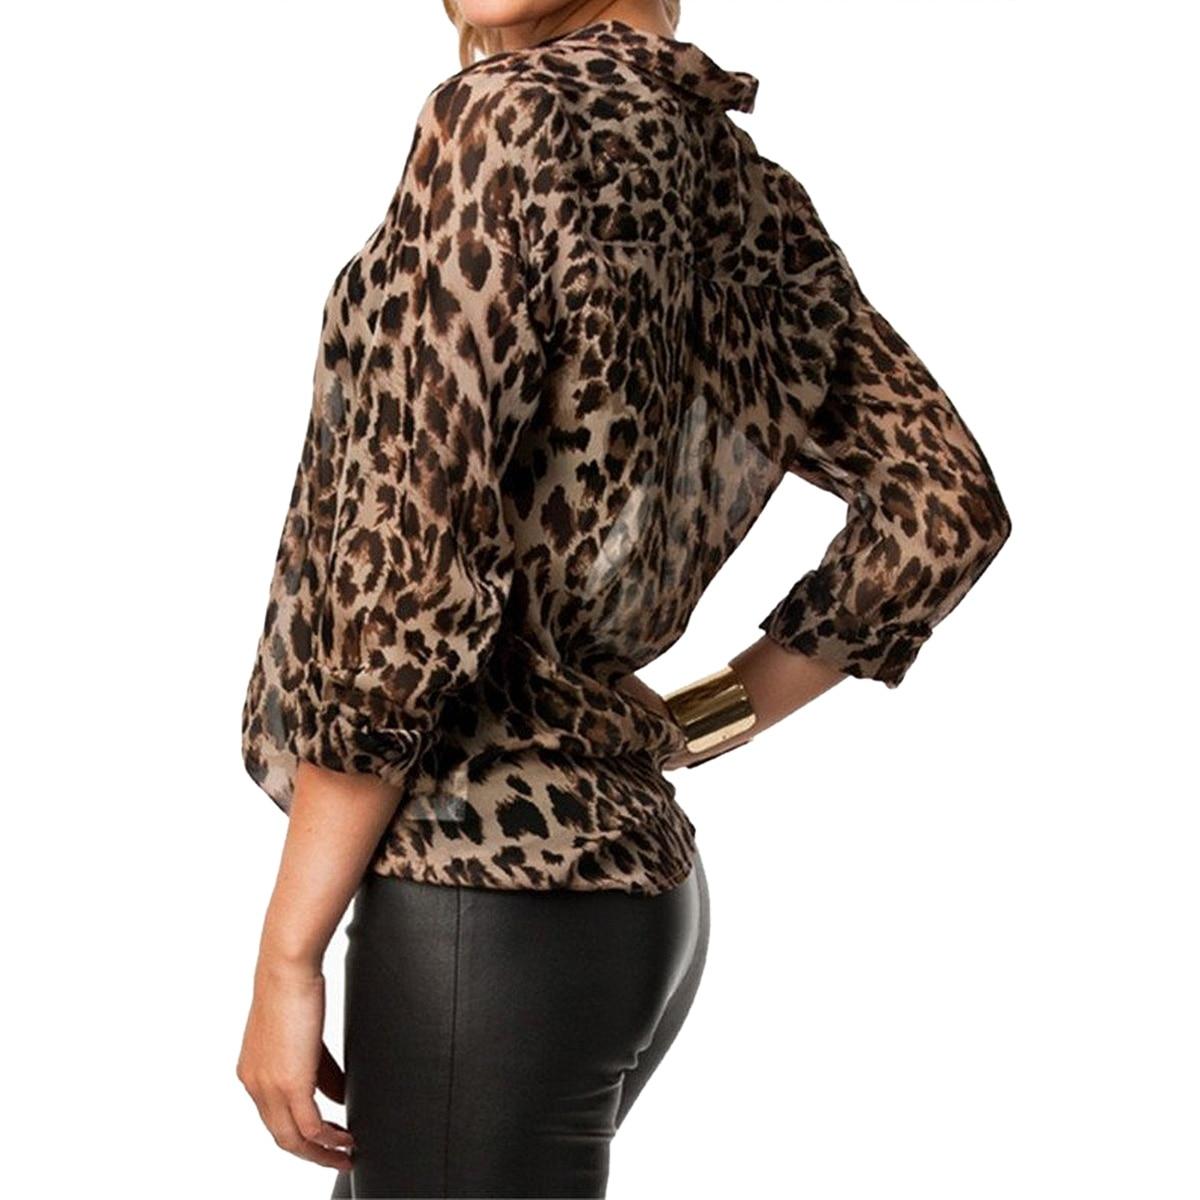 High Street Blusas Femininas Women Blouse Ladies Sexy Long Sleeve Leopard Print Chiffon Blouses Blusas Tops Shirt for Women